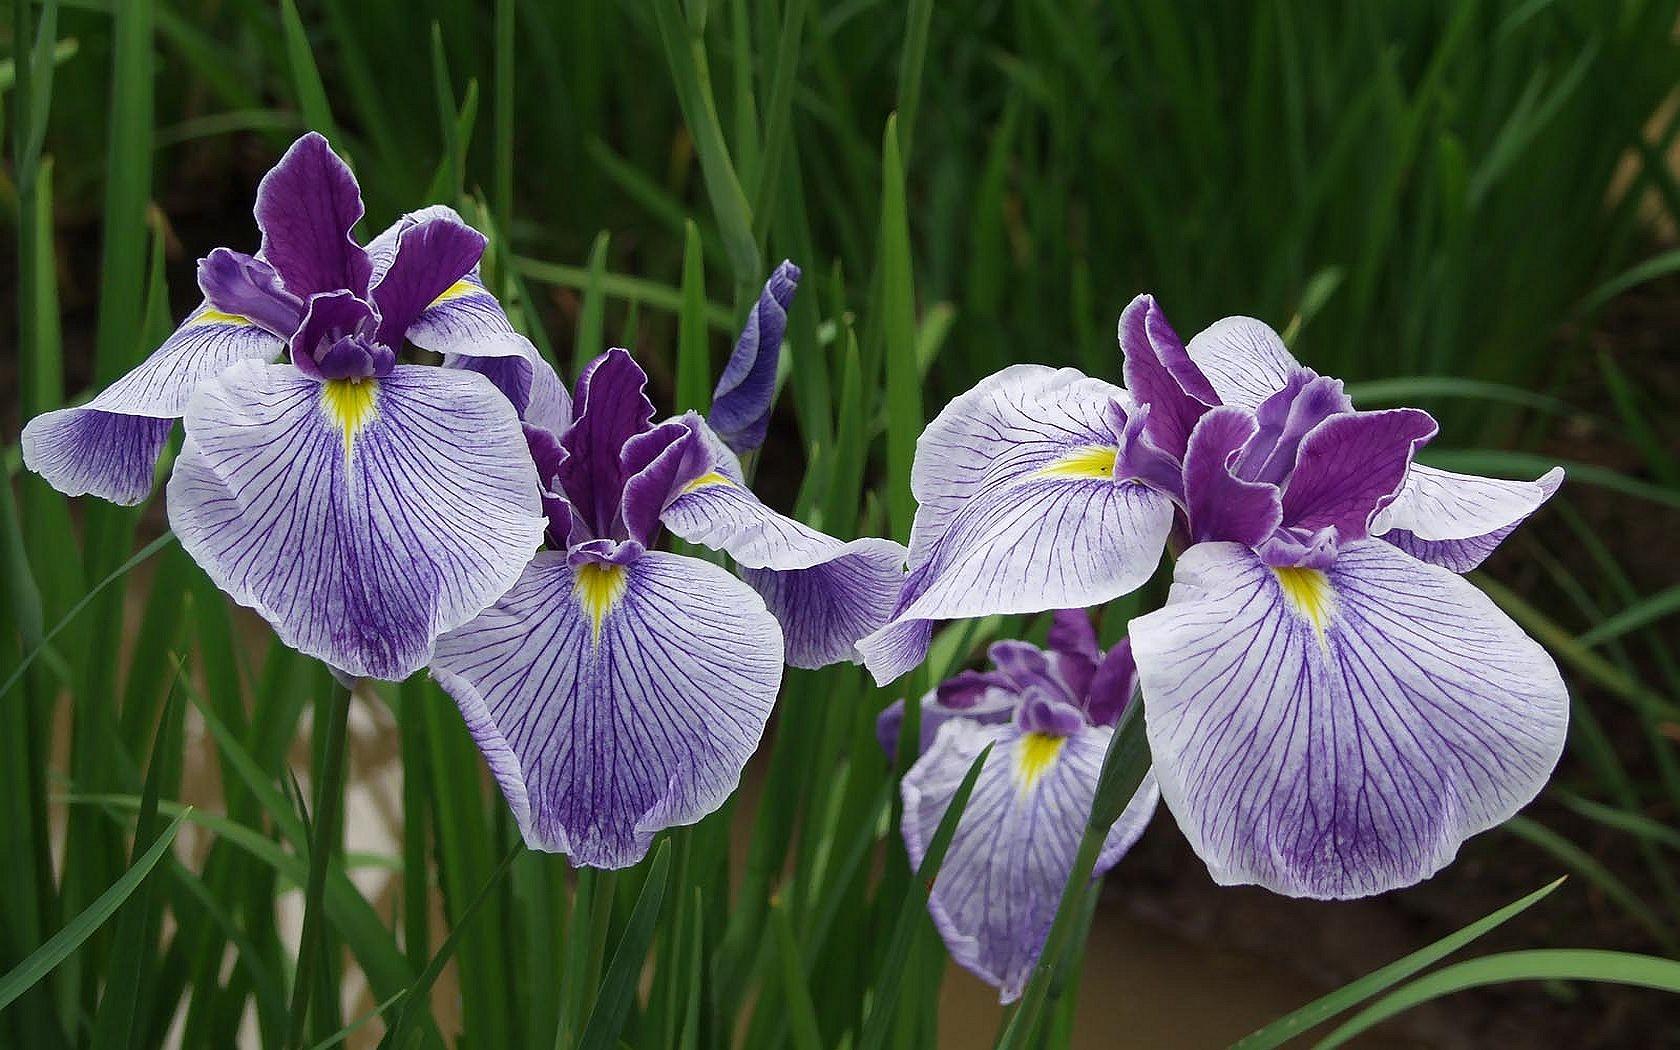 Wallpaper flowers iris flower eye flora botany land plant flowers iris flower plant eye flora botany land plant flowering plant close up iris versicolor iris izmirmasajfo